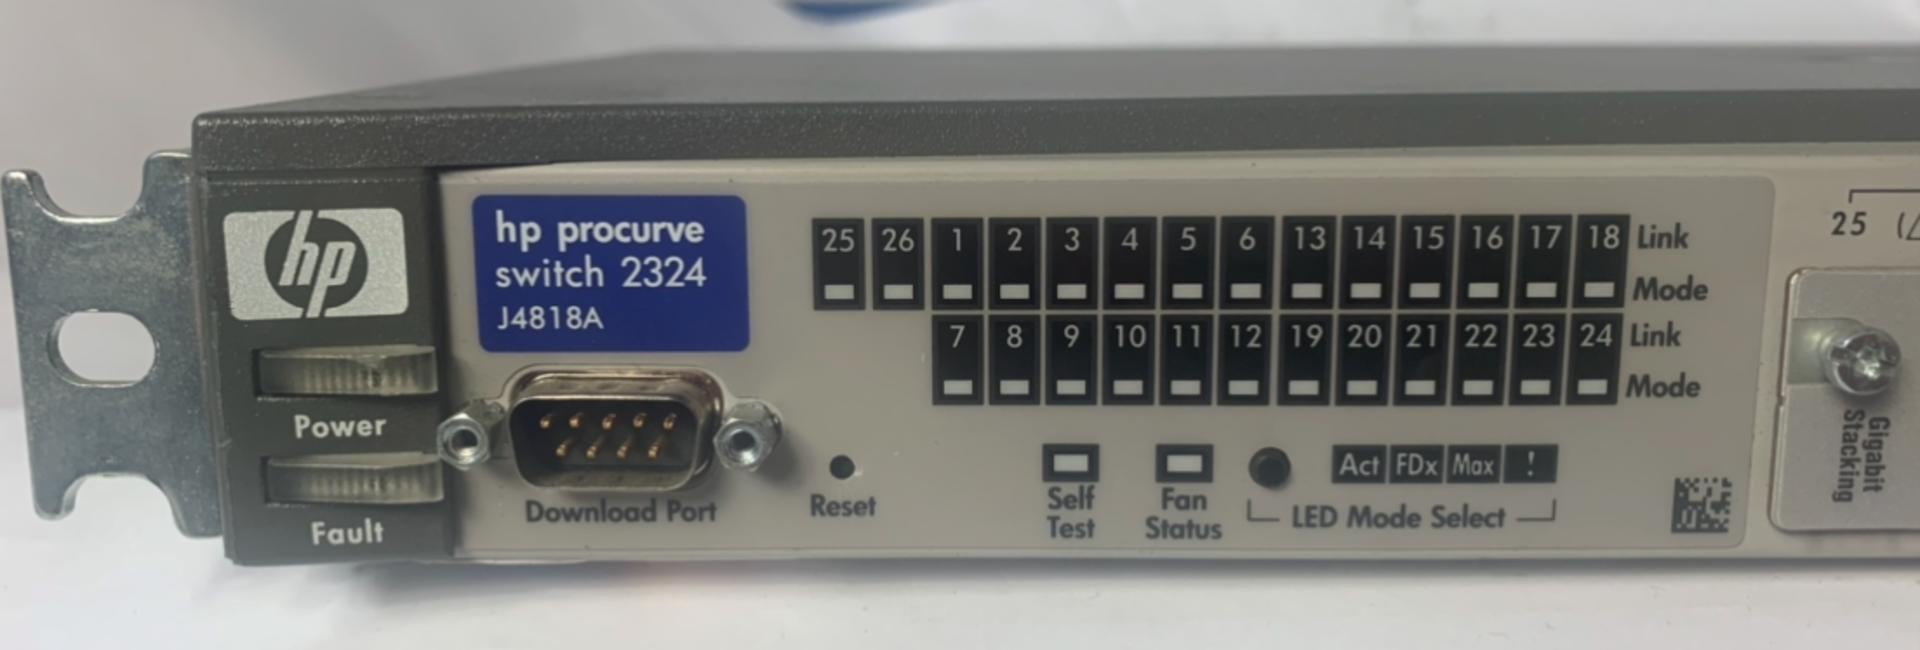 Lot 51 - HP J4818A Pro 24 Port Switch